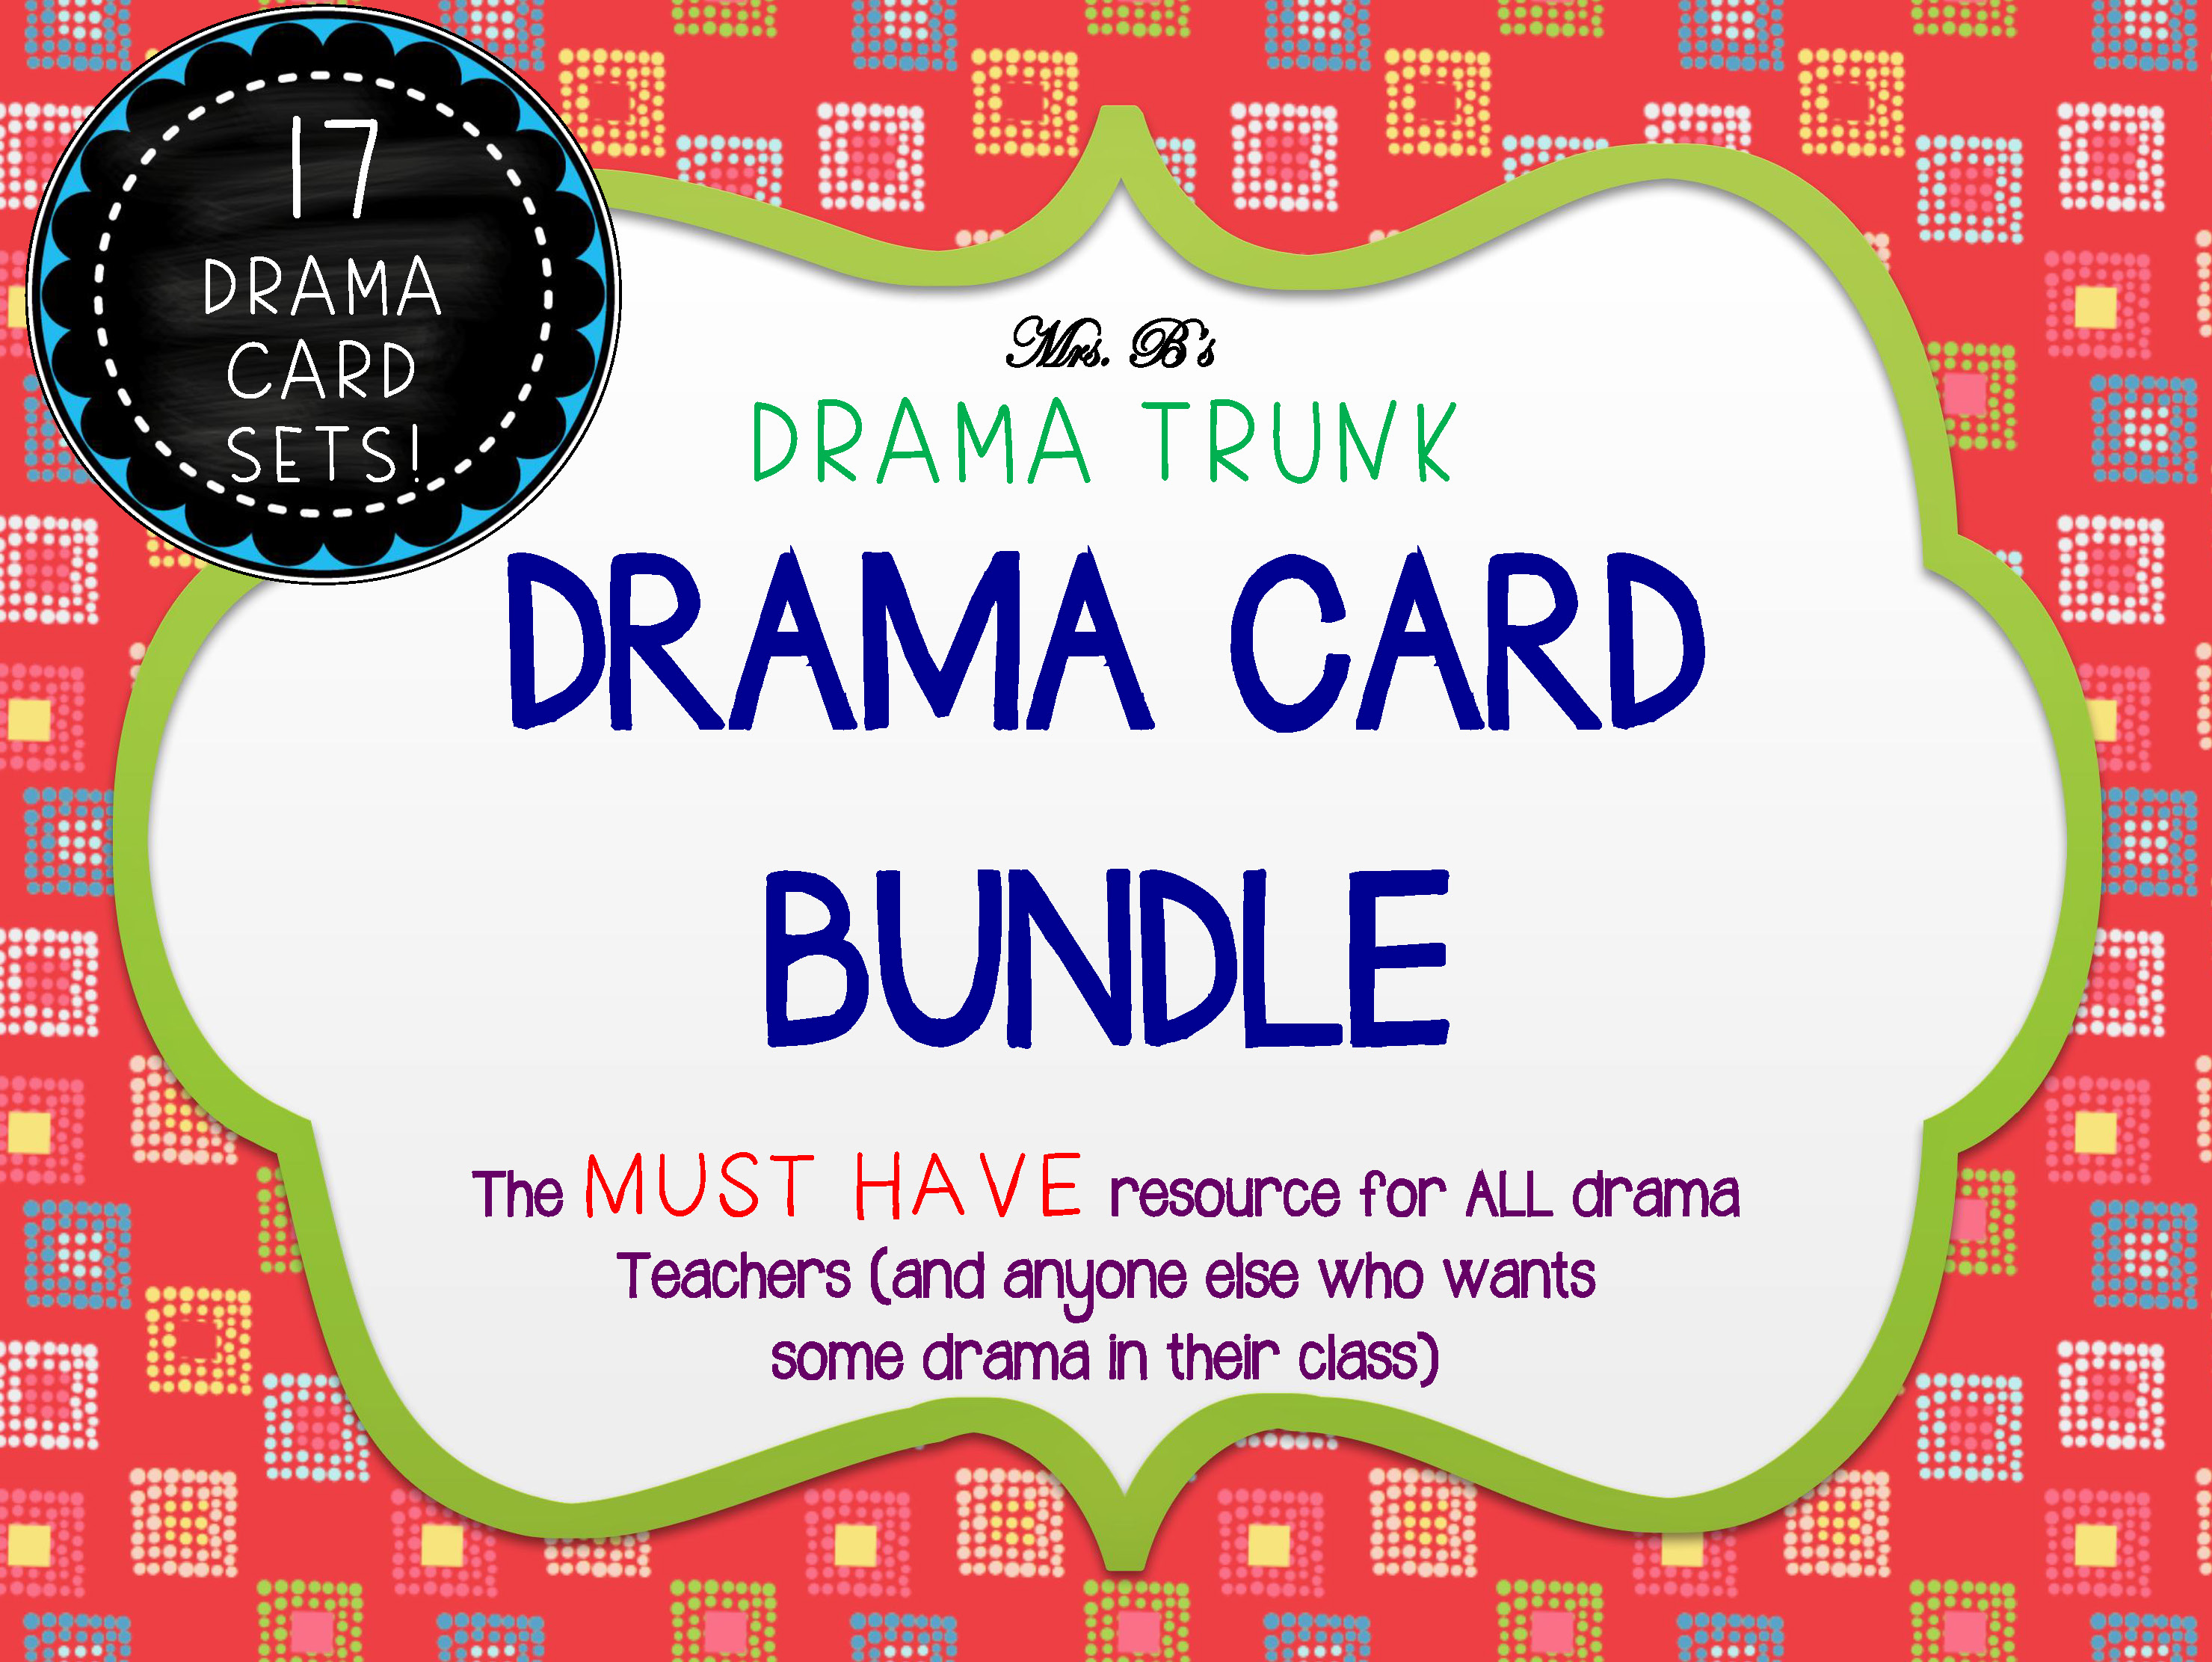 Drama Card Bundle and Drama Activities by DRAMA TRUNK